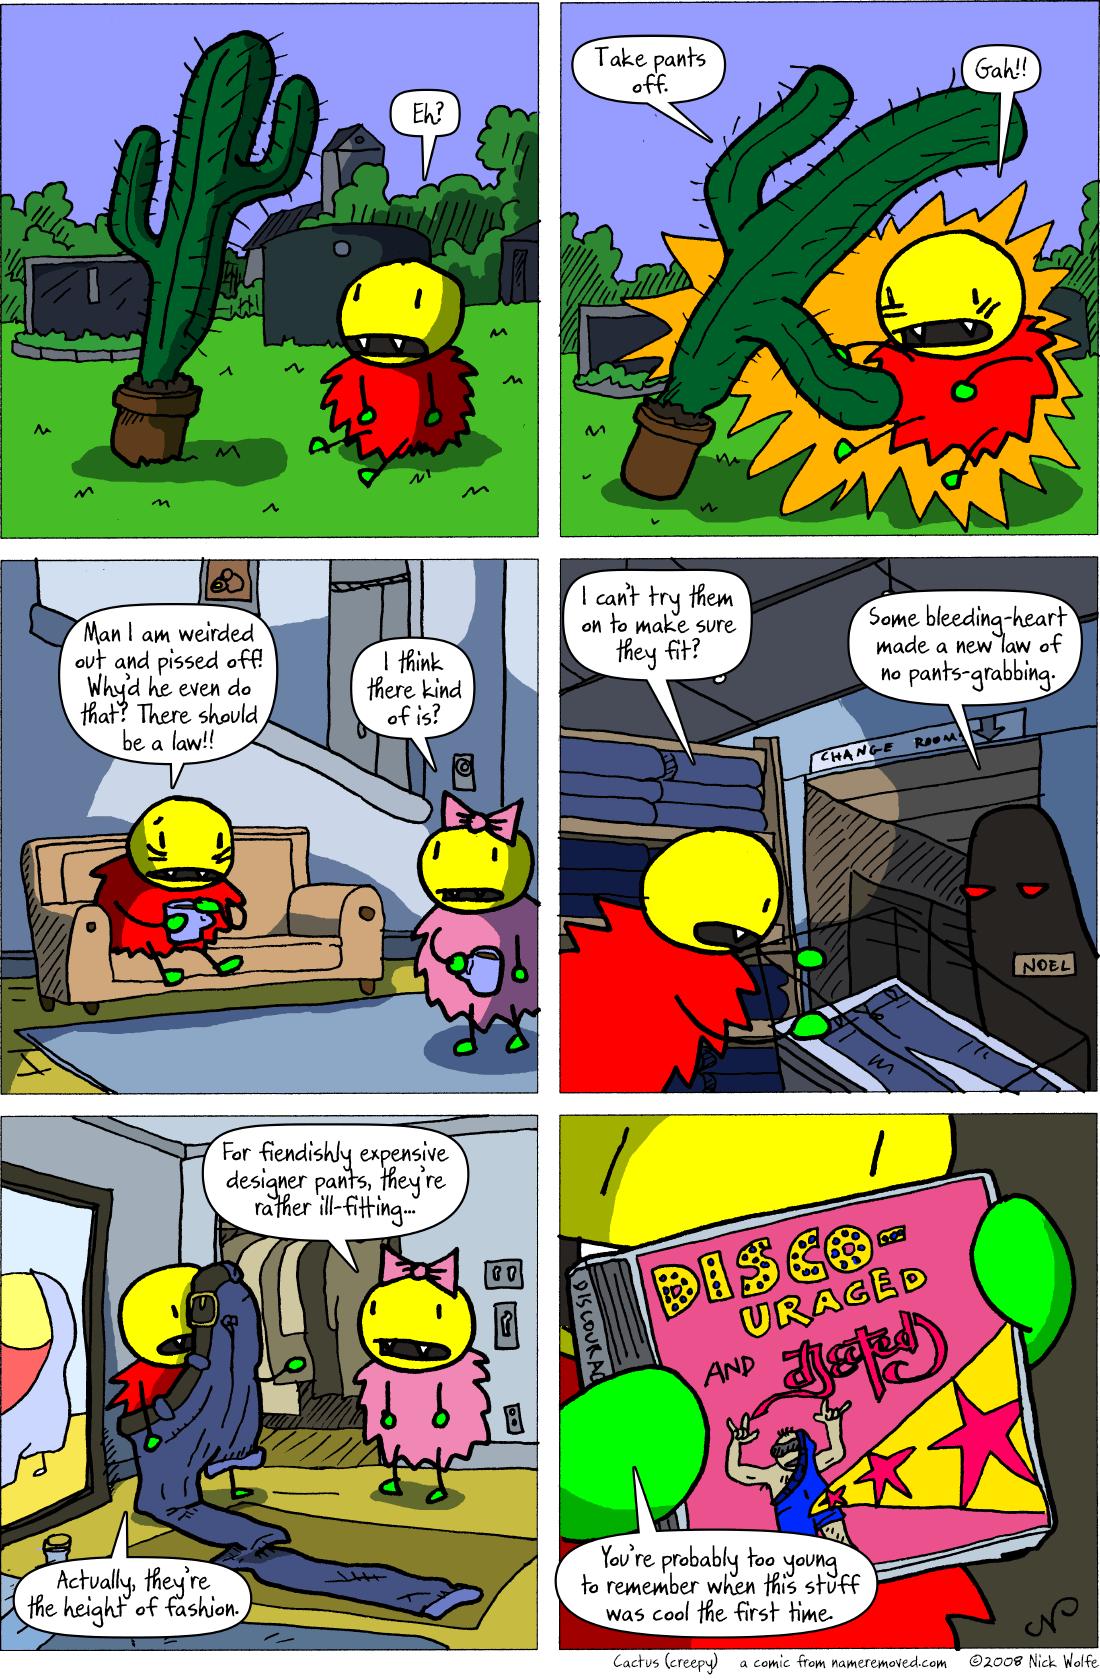 Cactus (creepy)